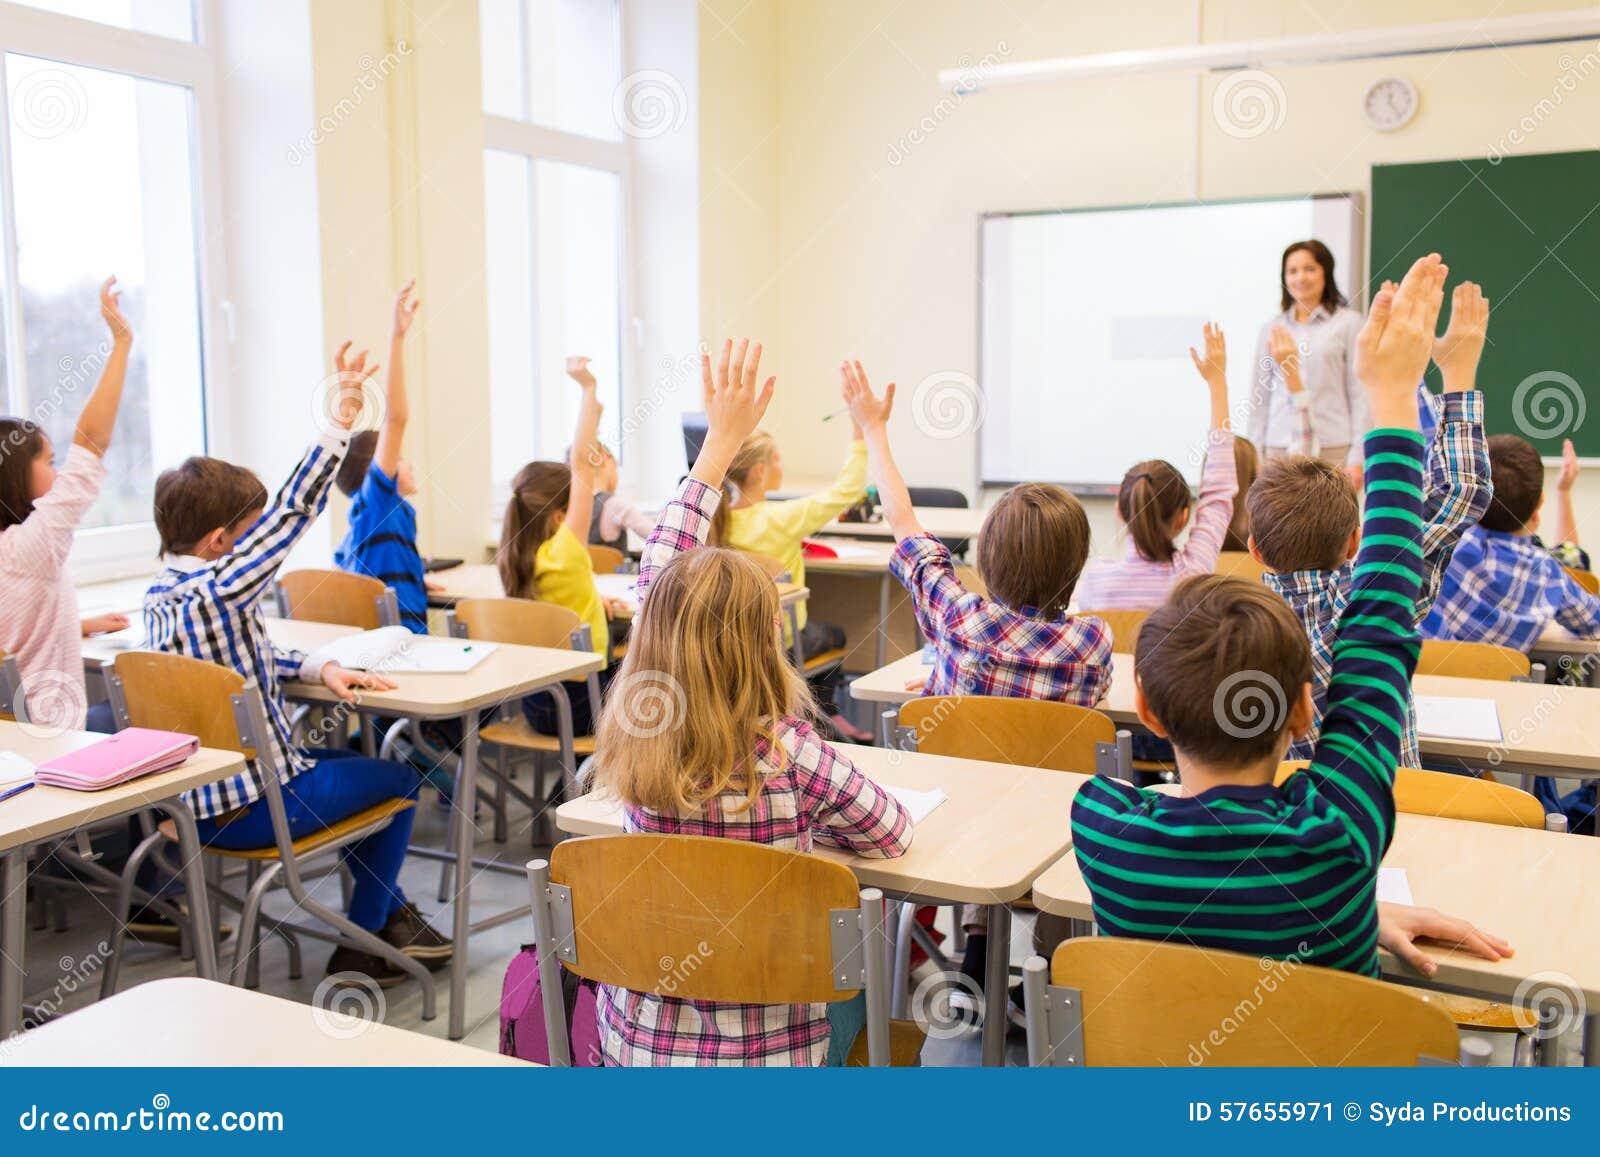 d7f15d2d31d Group of school kids raising hands in classroom stock image